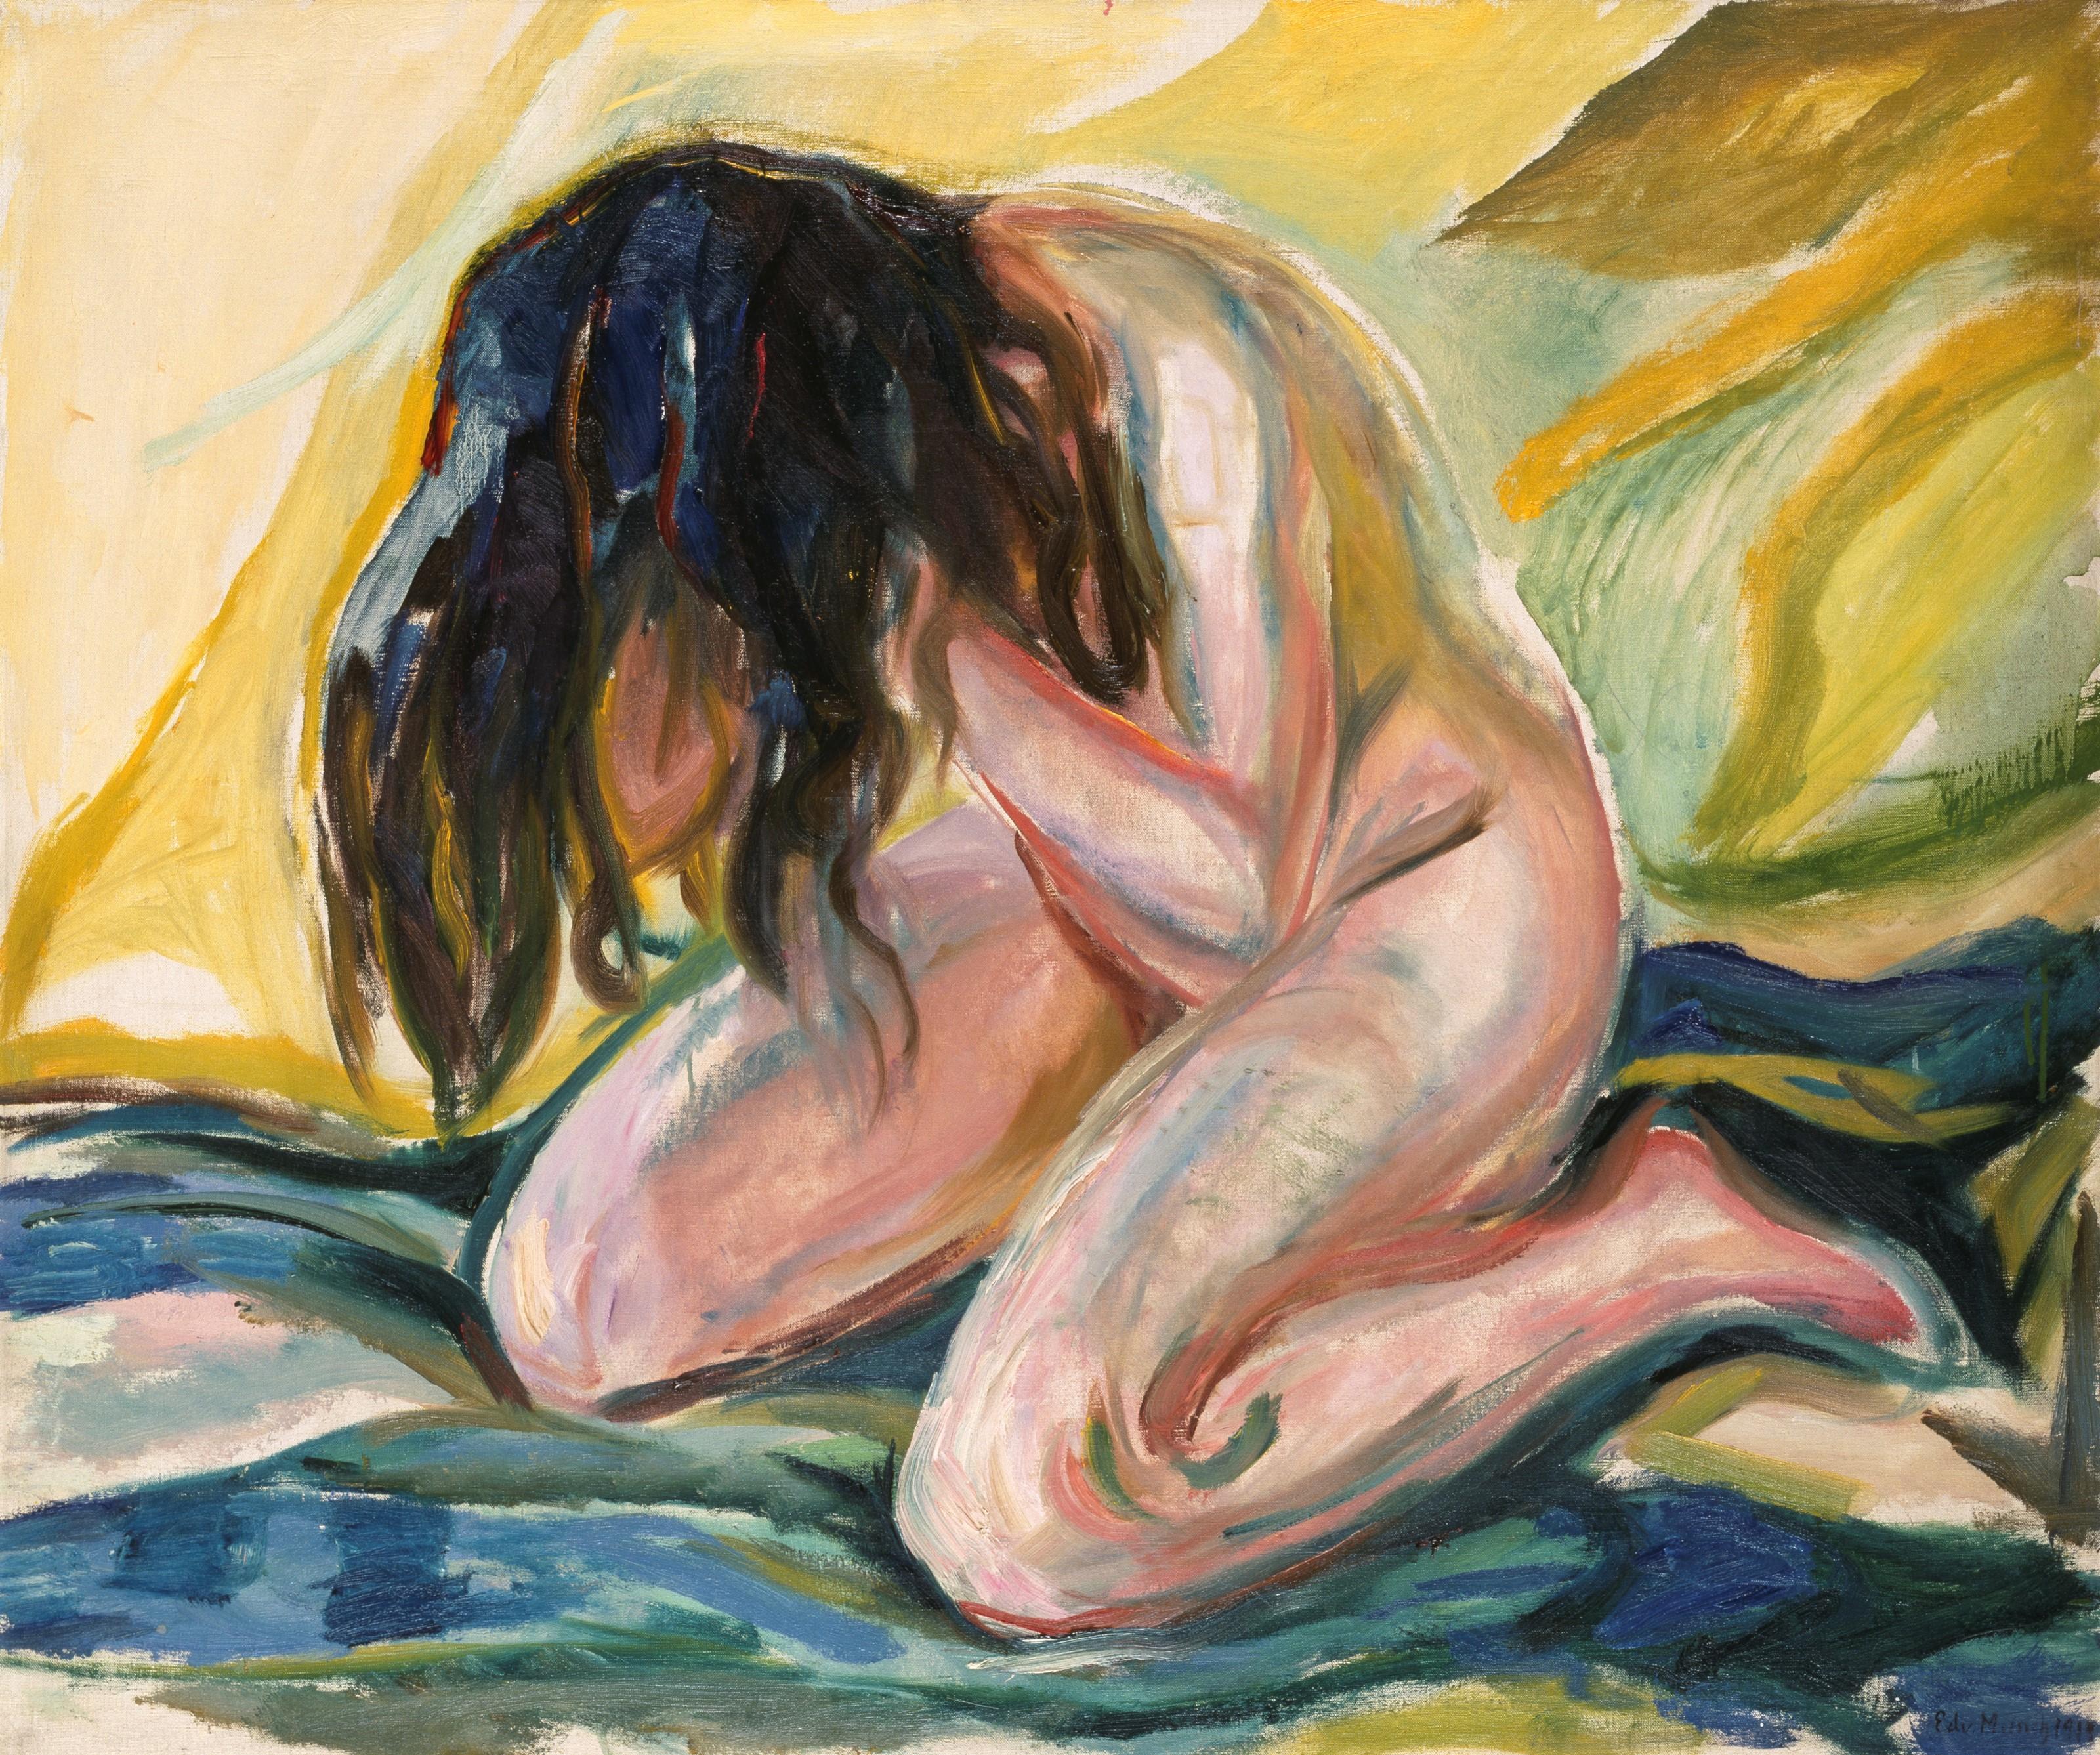 Edvard_Munch_-_Kneeling_Female_Nude_-_BF.1969.1_-_Museum_of_Fine_Arts,_Houston